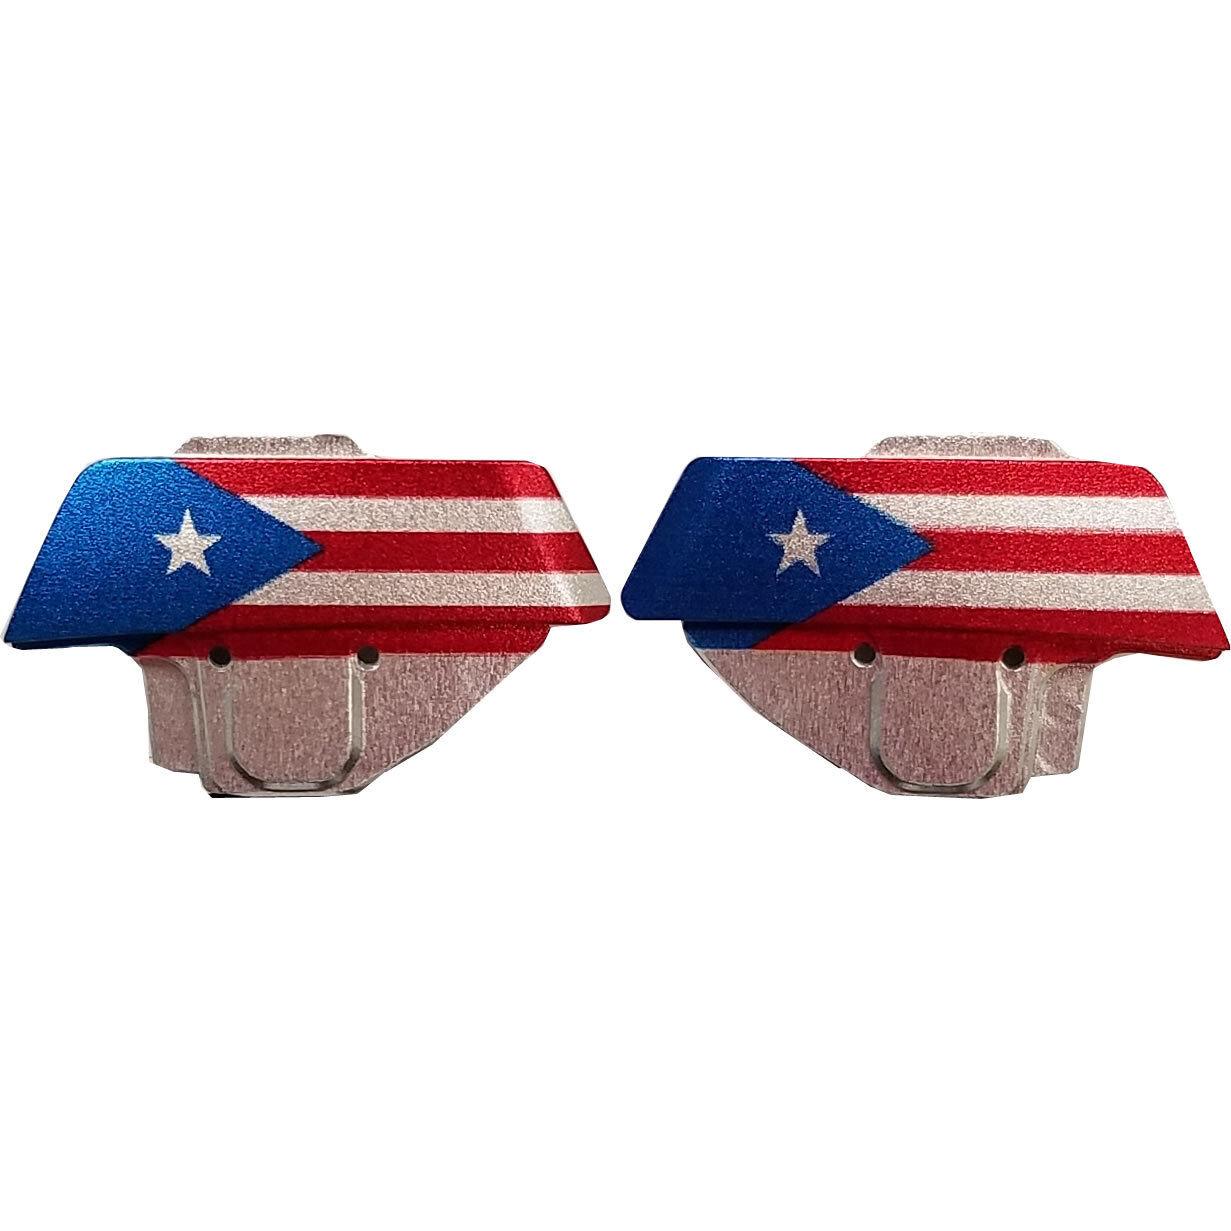 Eclipse CS2 Eye Cover Kit - Puerto Rico - Paintball